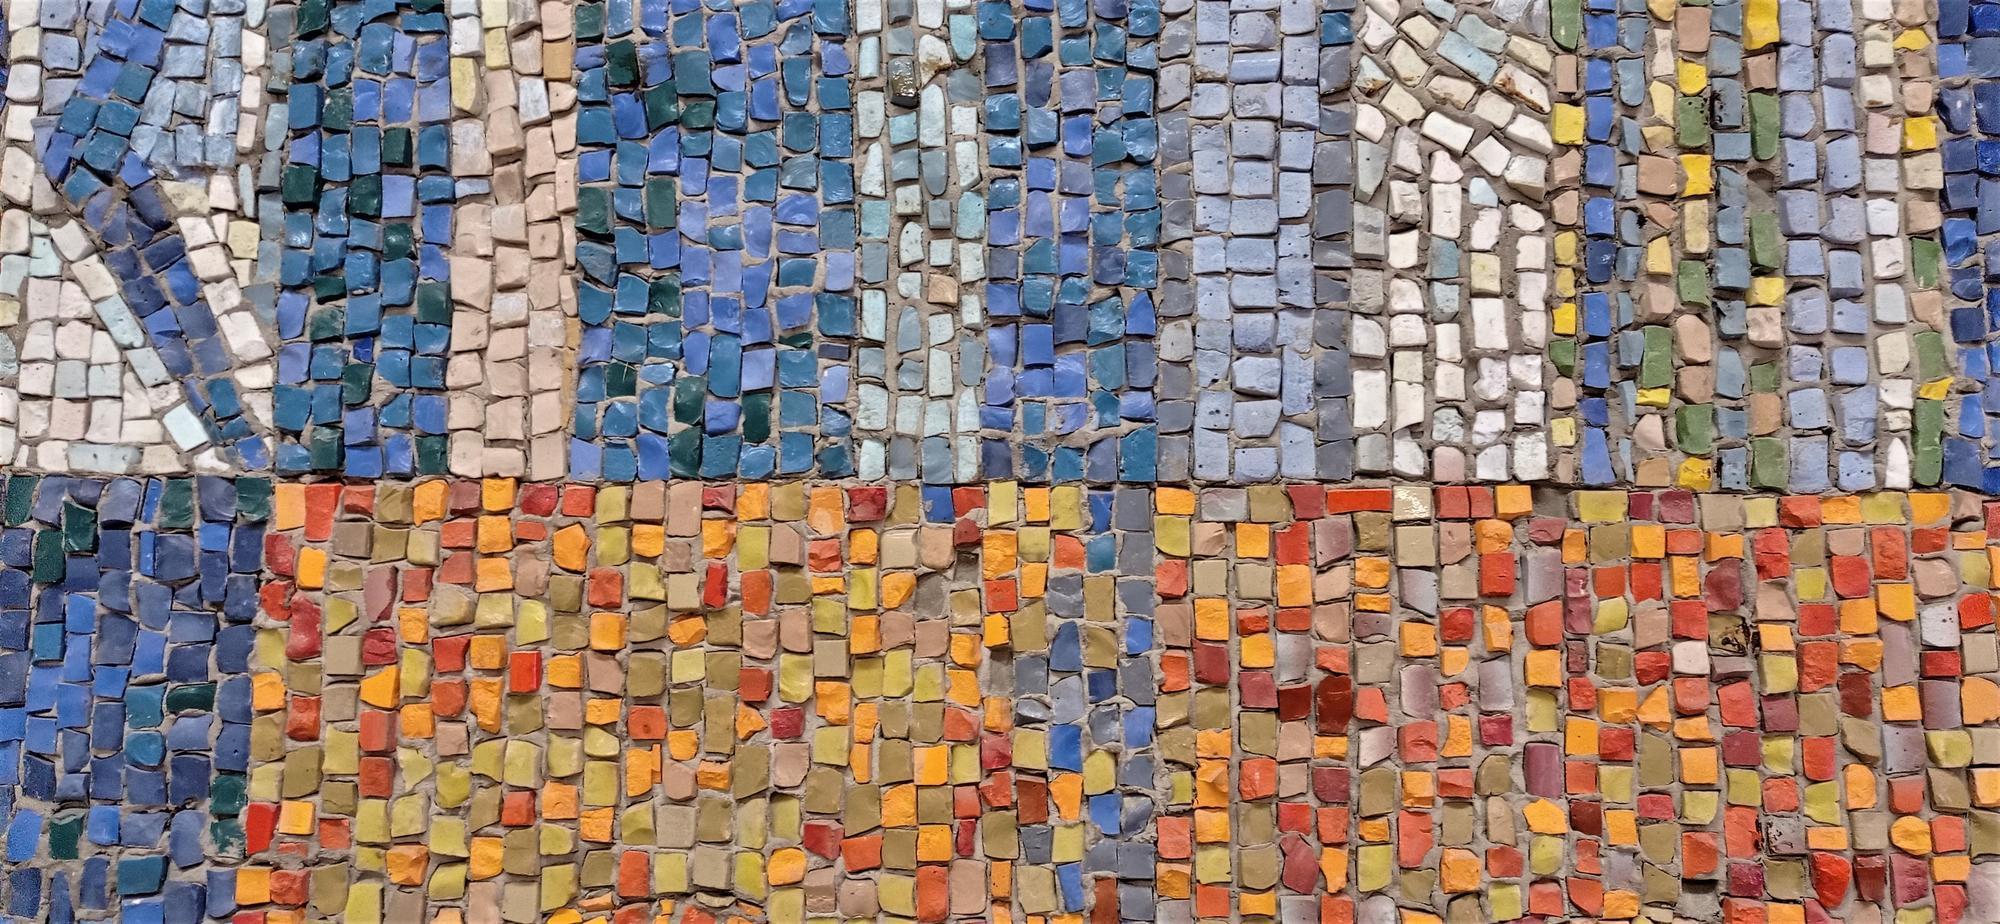 фрагмент мозаїки у Світлодарську